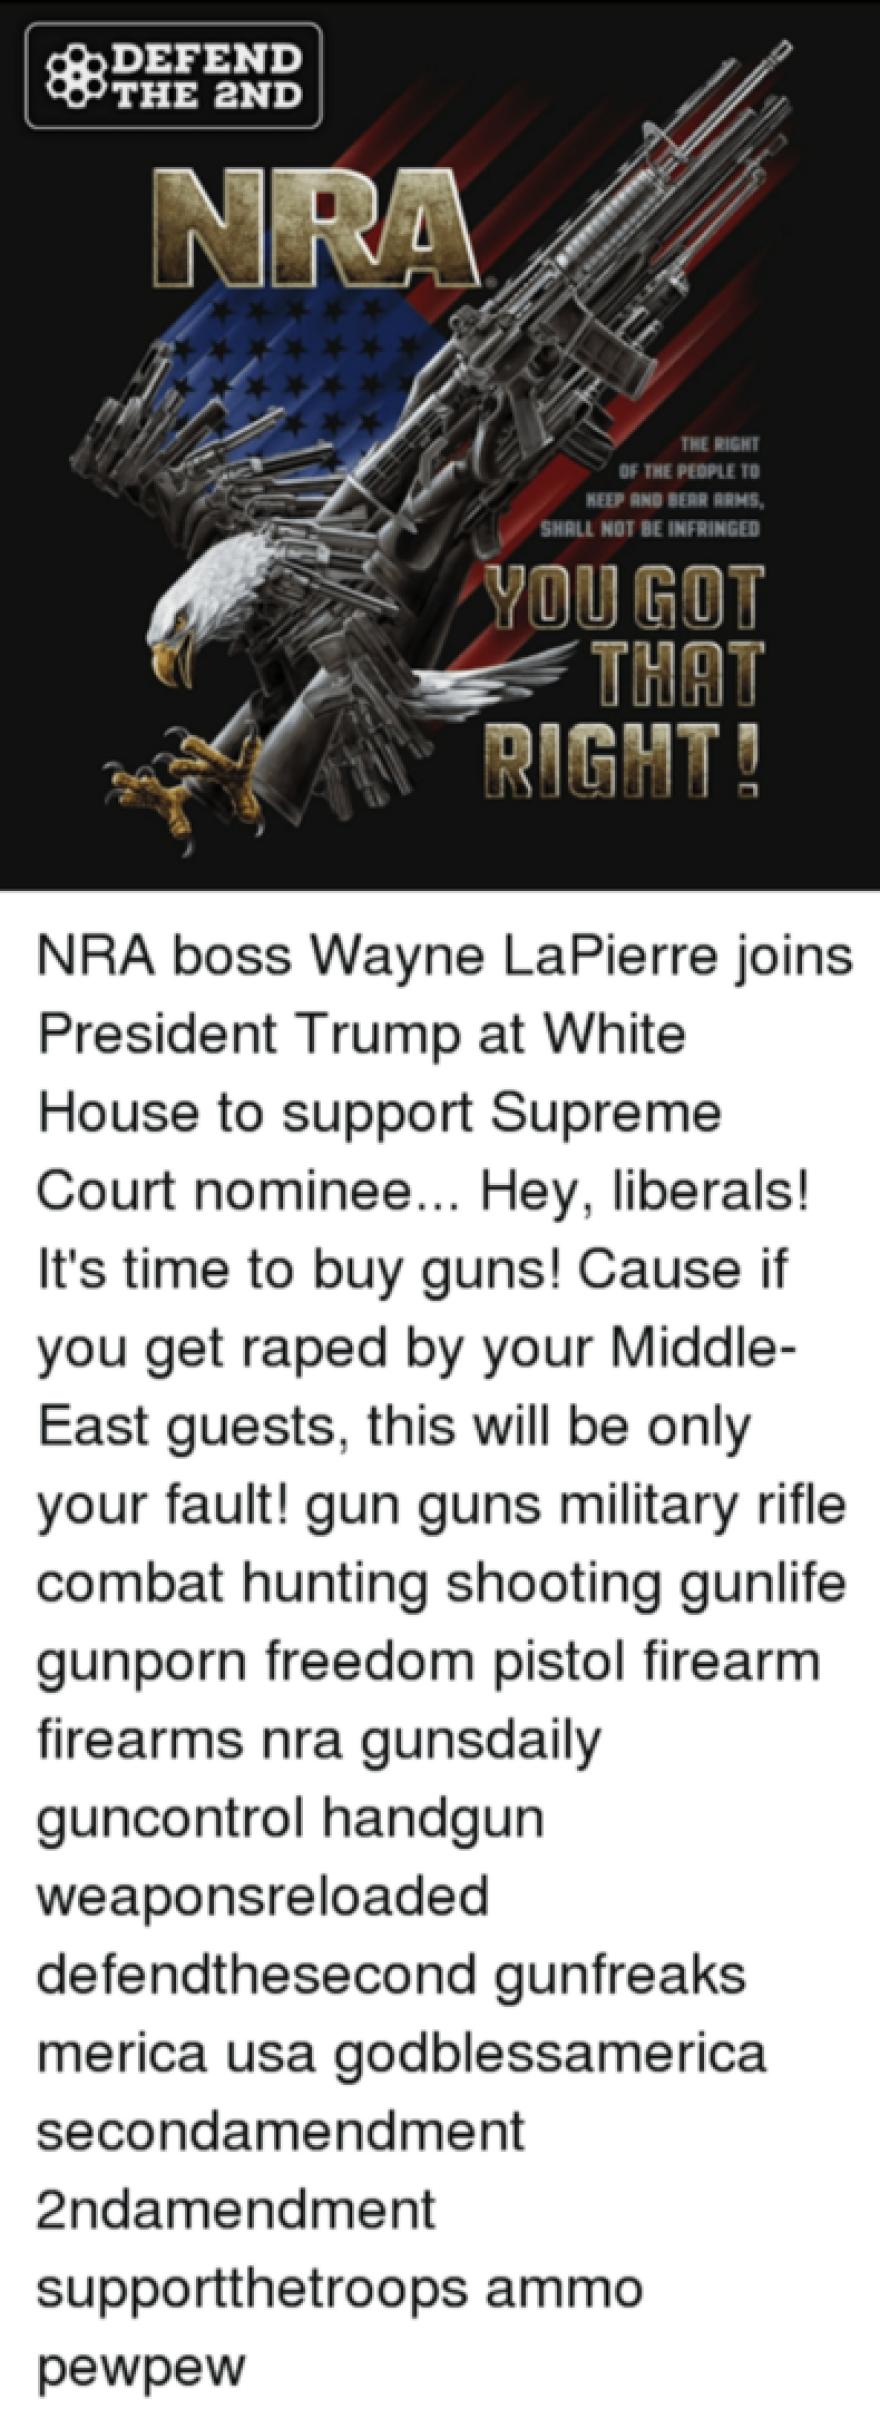 NRA/IRA Example 3